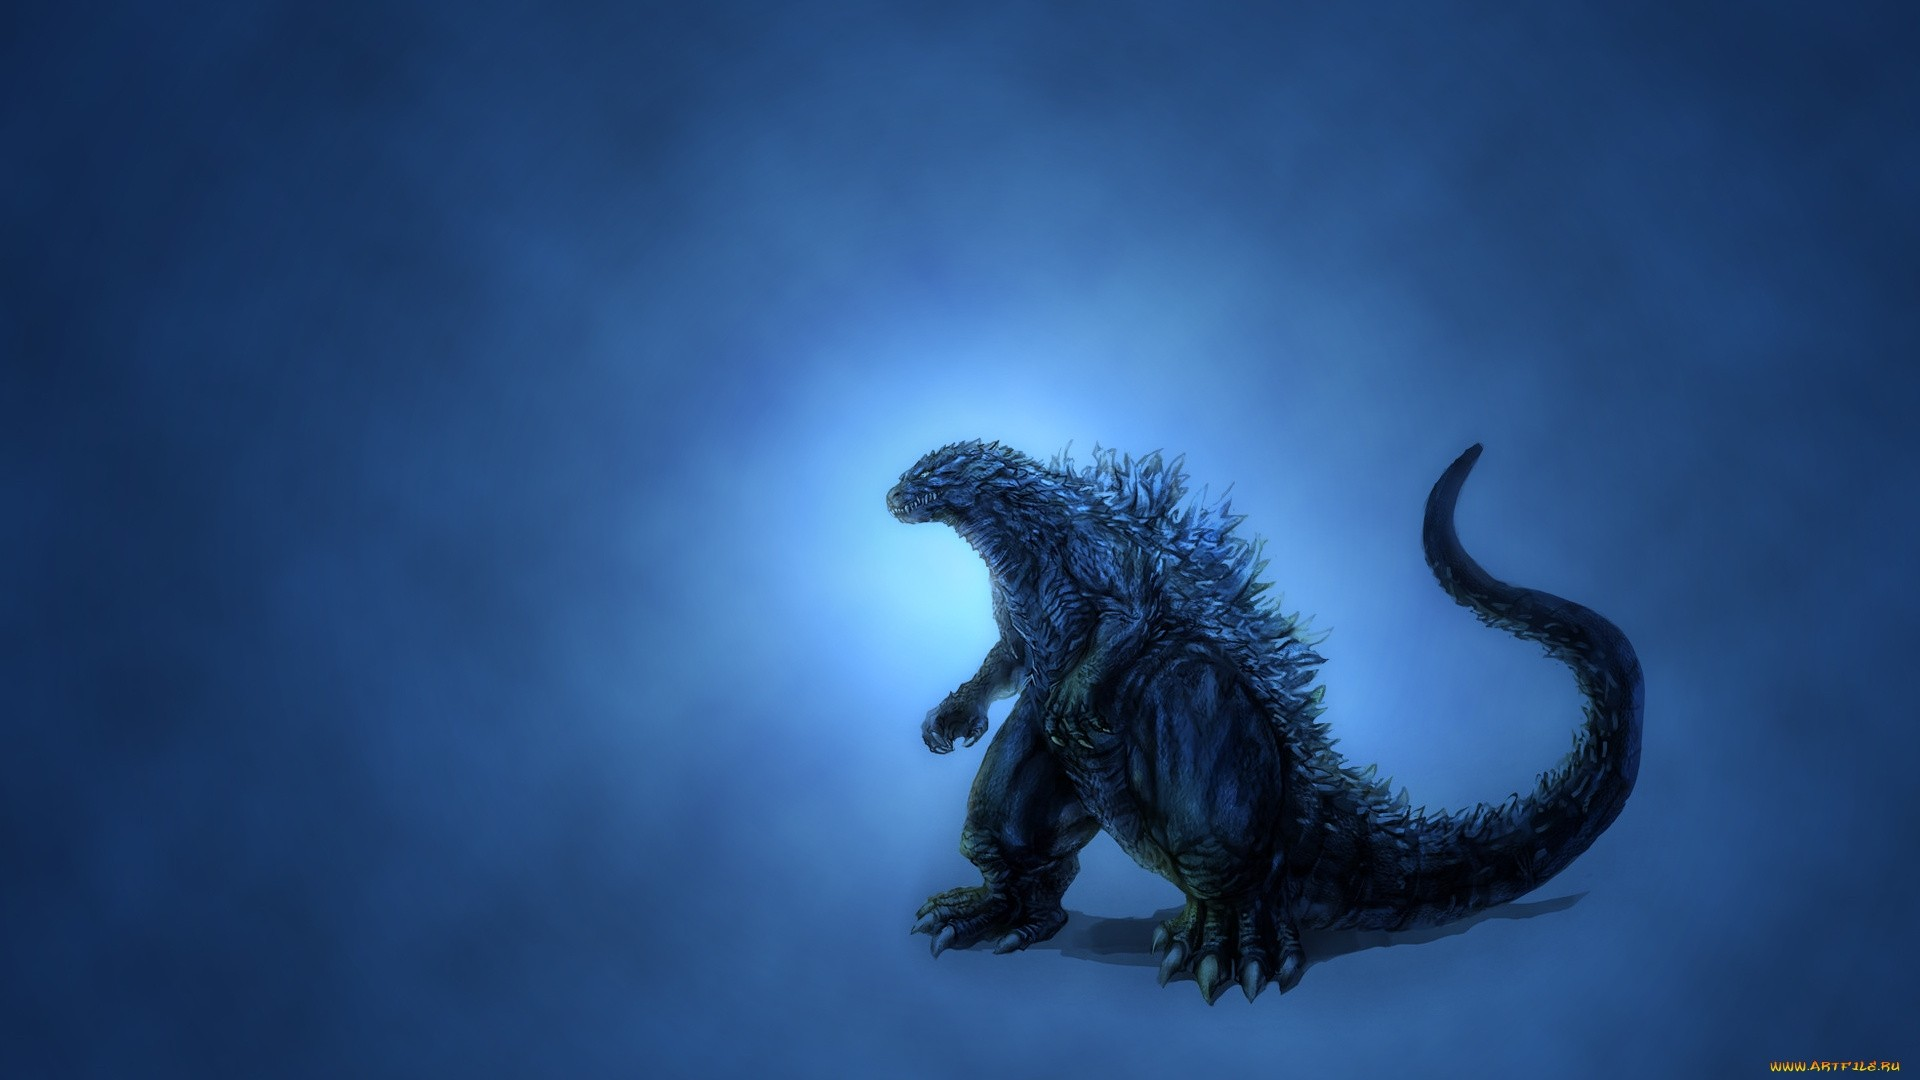 Minimalist Dinosaur Wallpaper Download